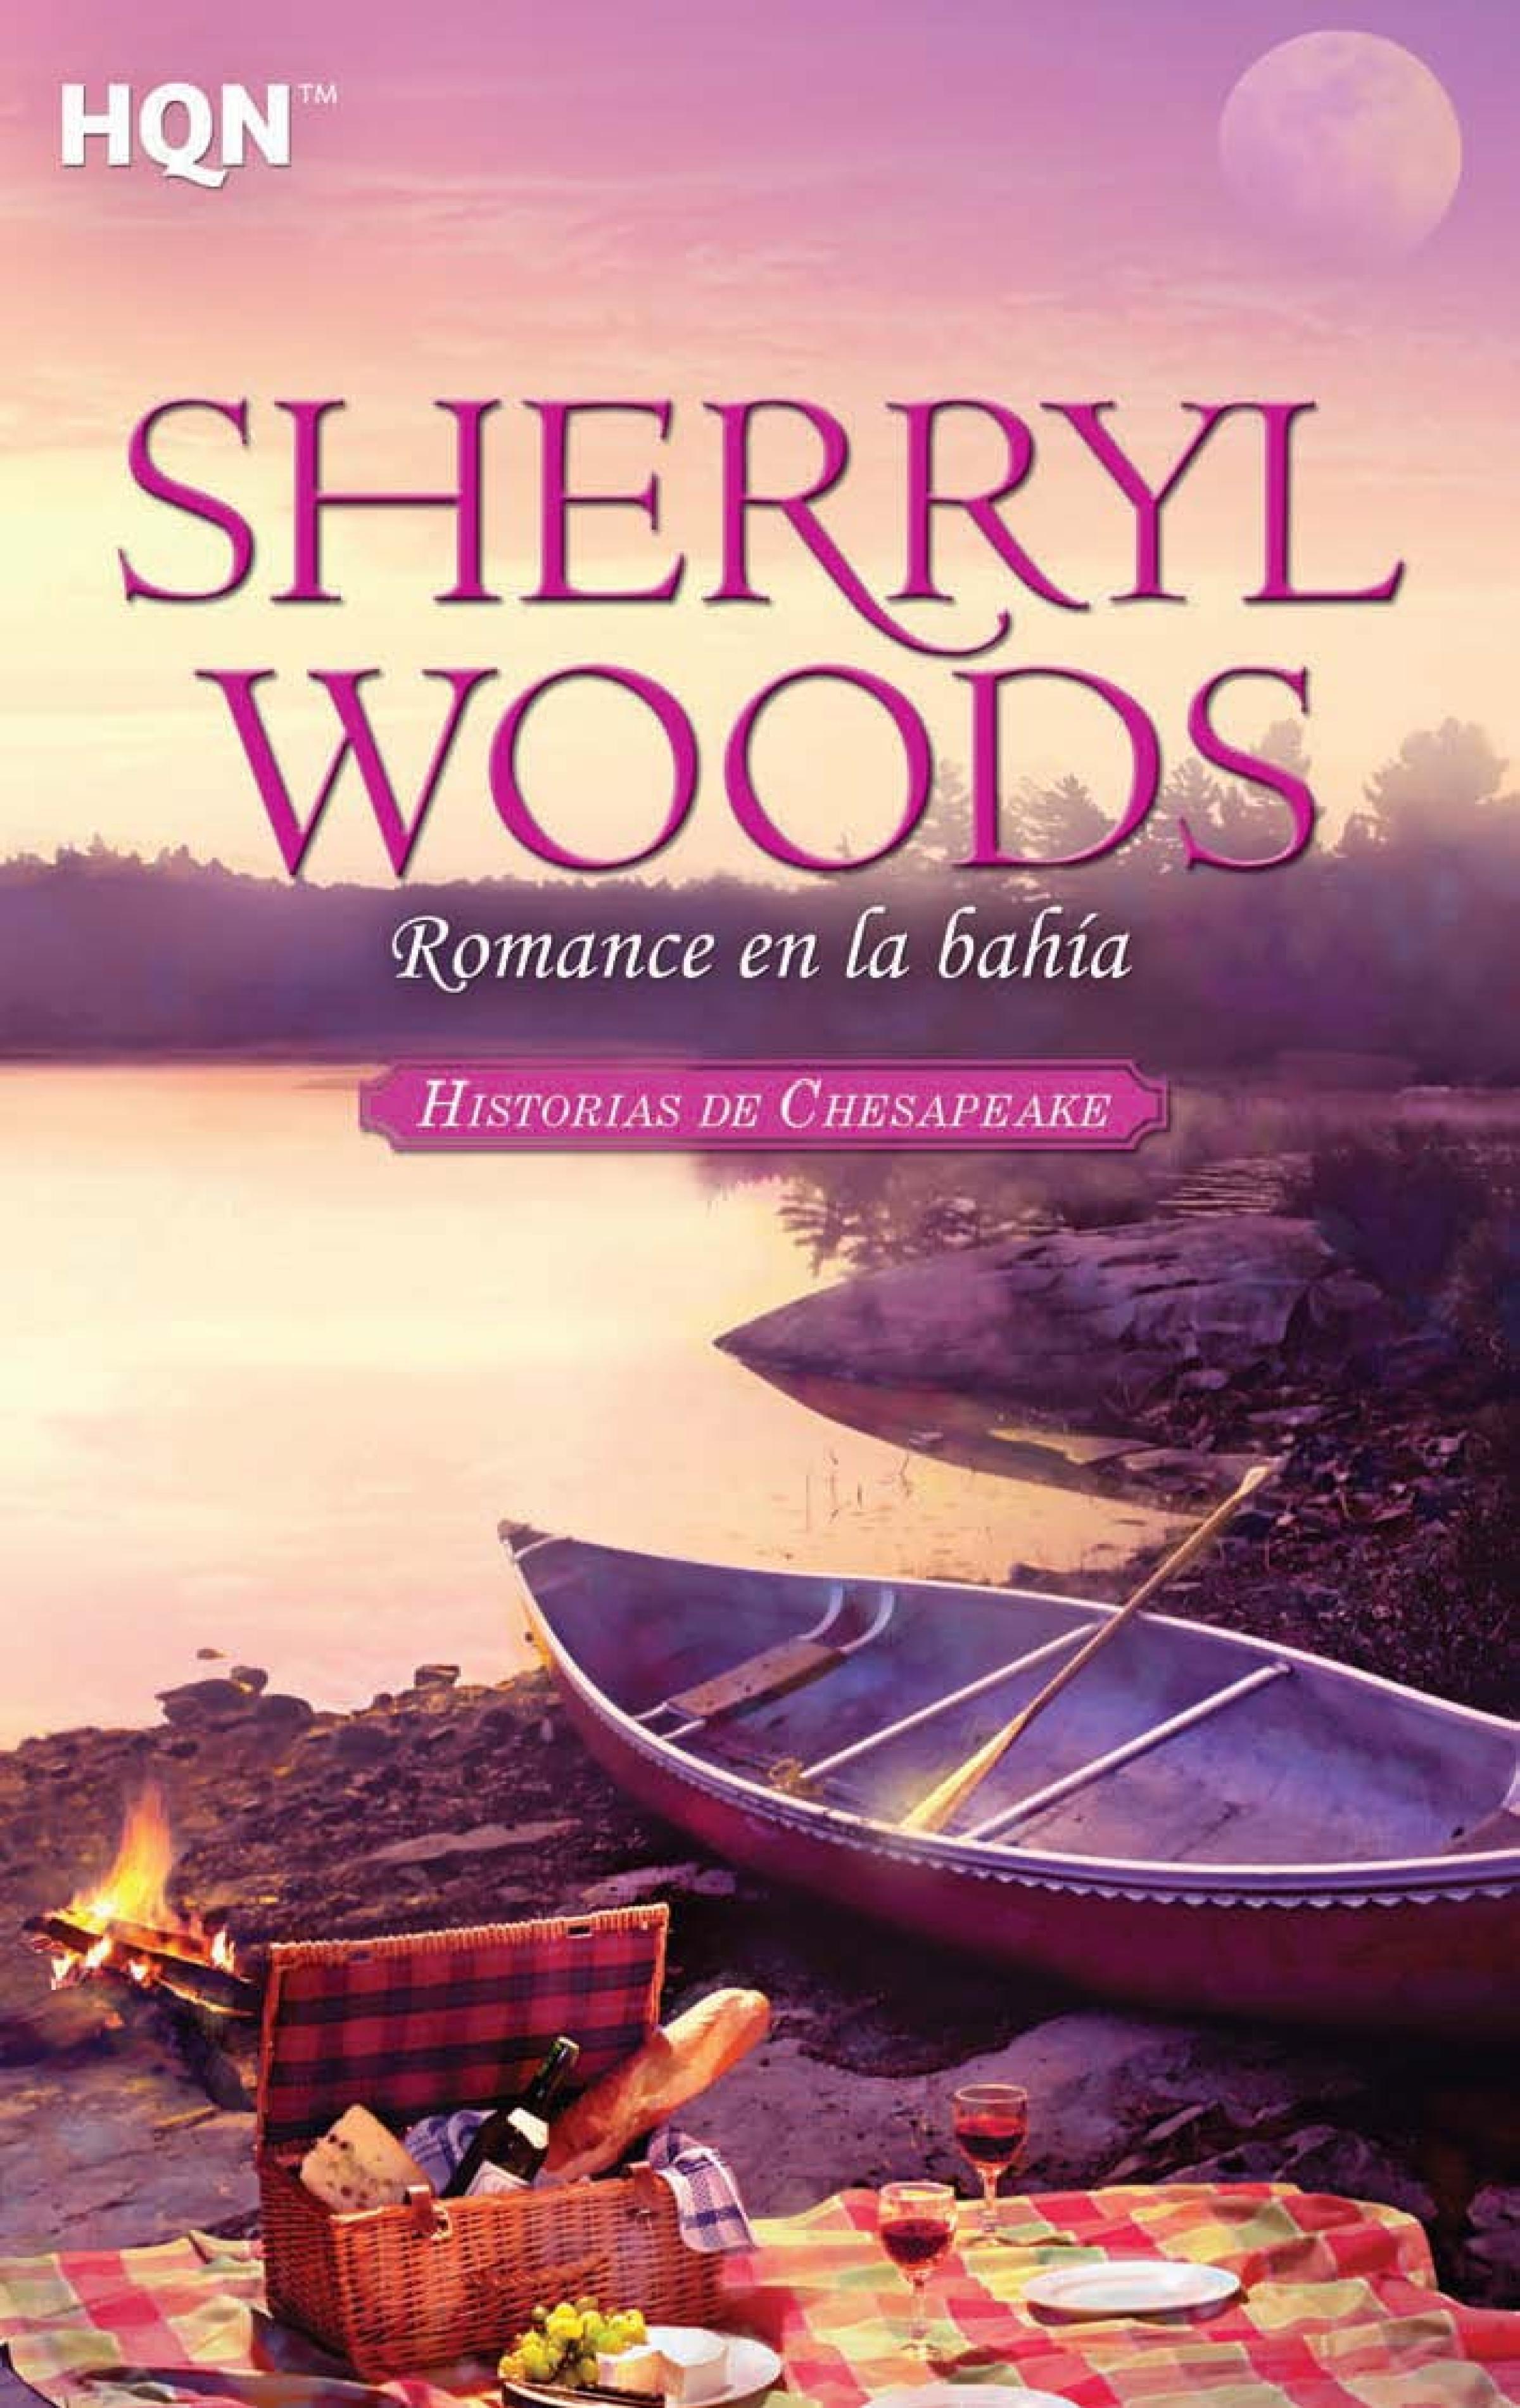 Sherryl Woods Romance en la bahía sherryl woods romance en la bahía